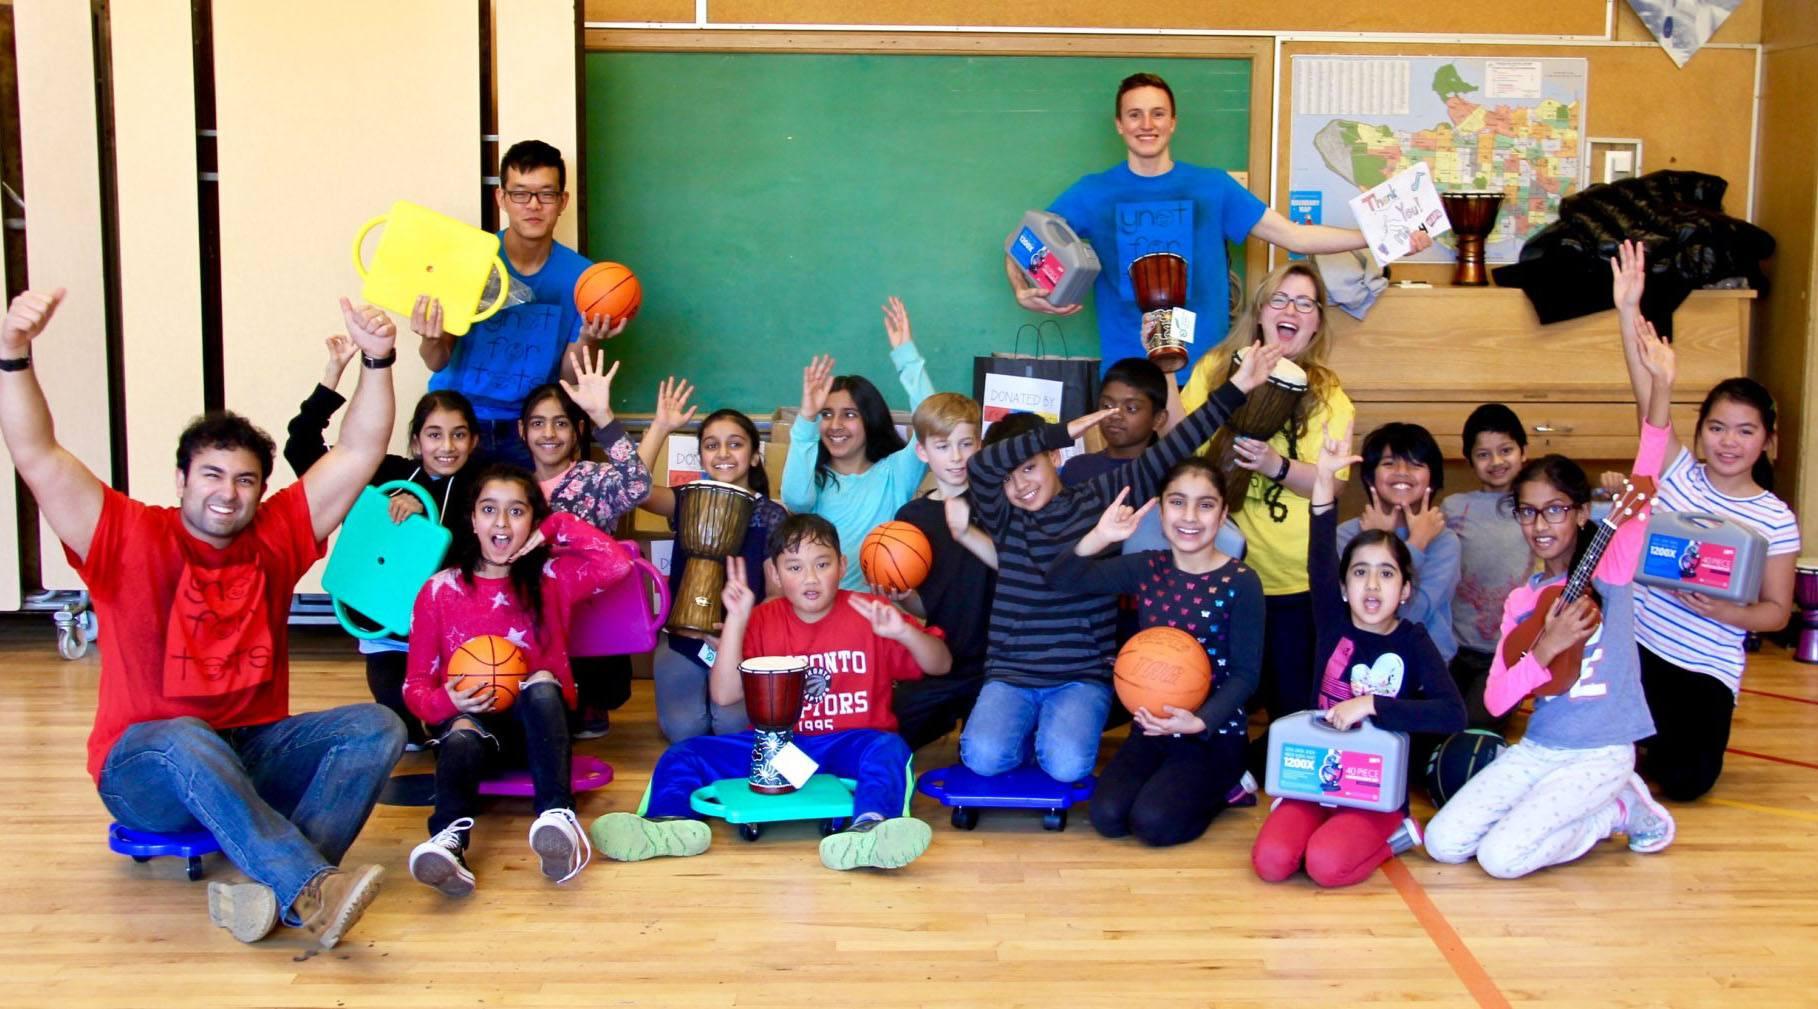 YNOTFORTOTS helps underprivileged kids in Metro Vancouver